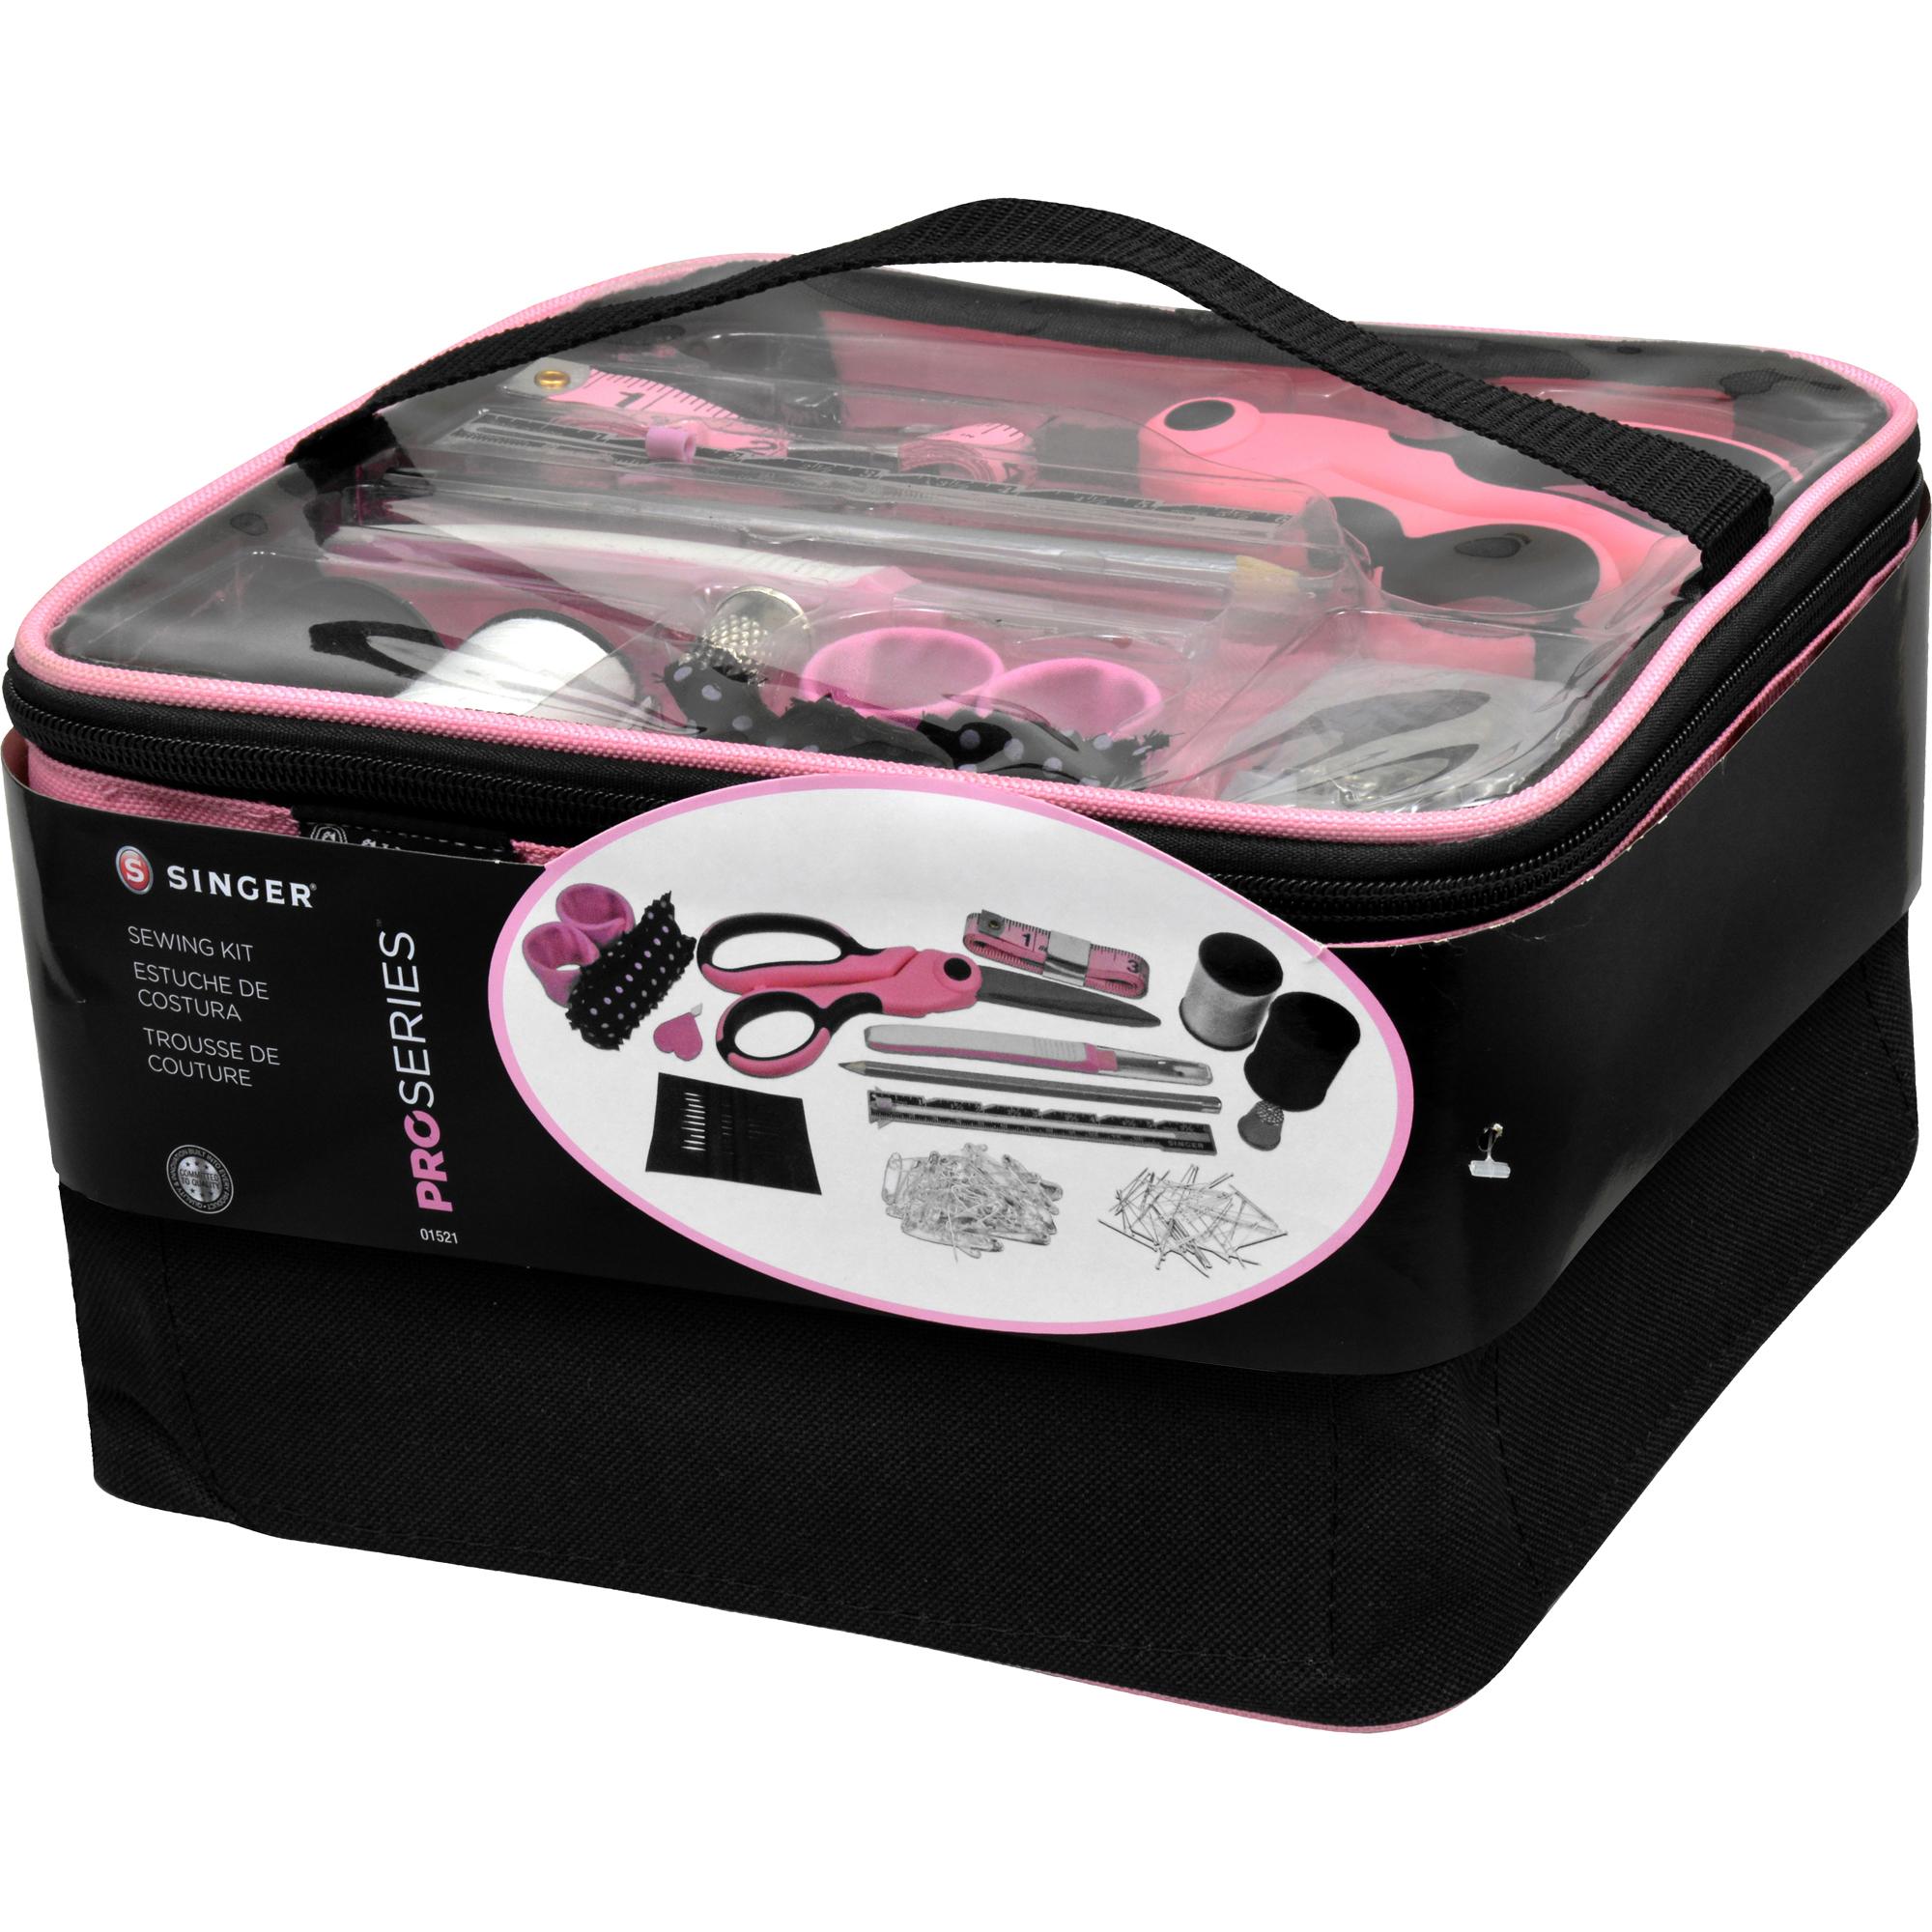 Singer SewPro Proseries 95 Sewing Kit with Storage Case